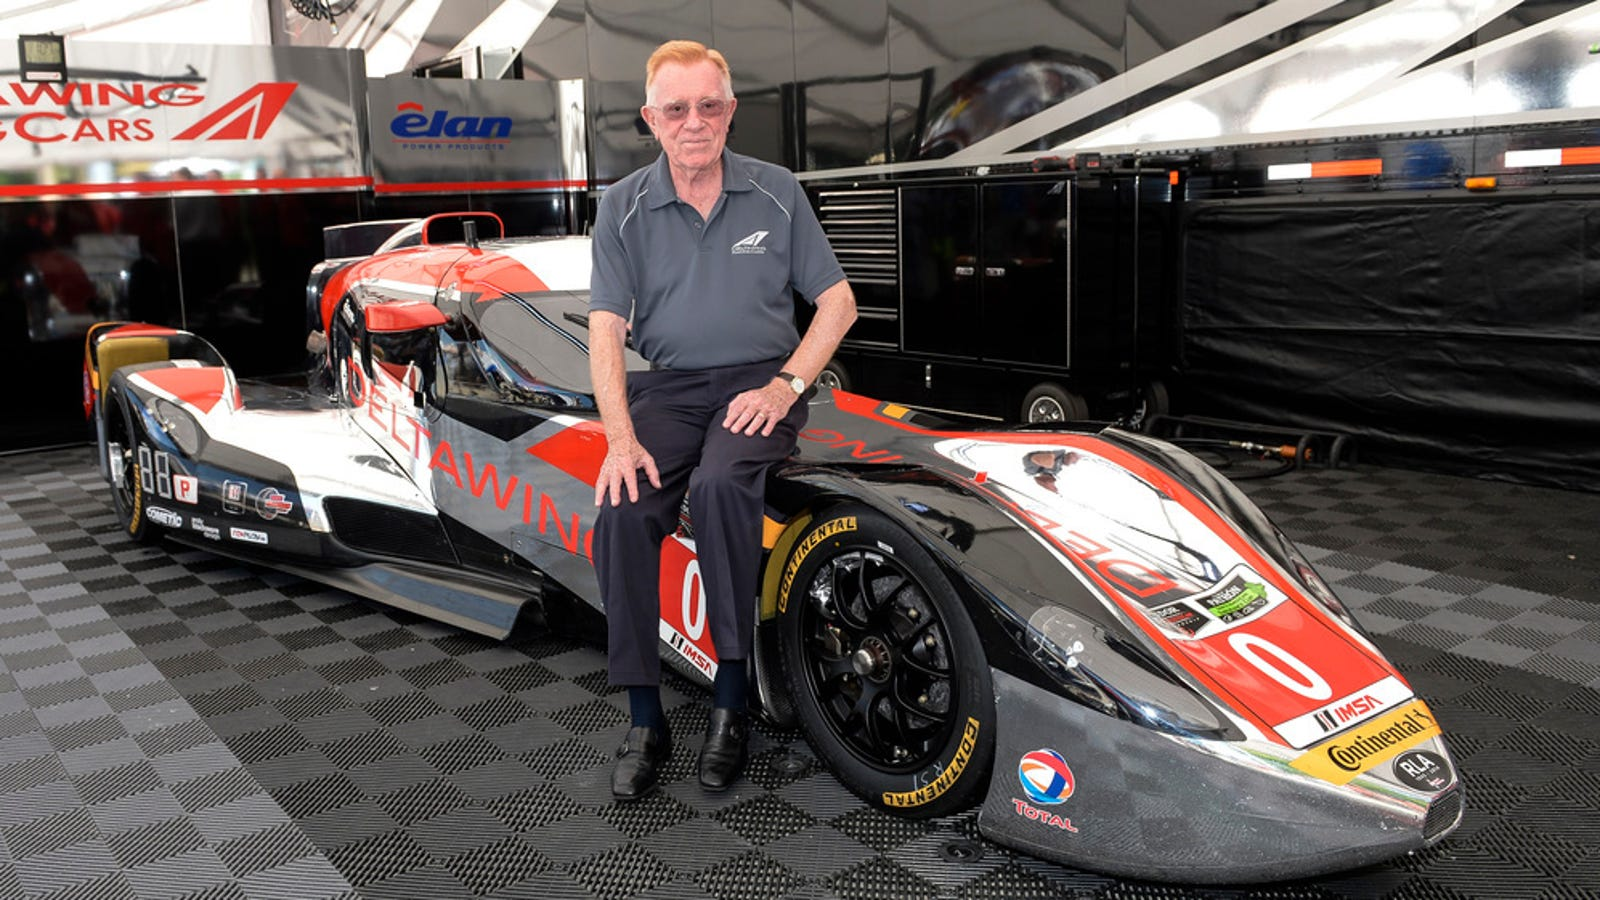 44 års racet Innovative Race Car Constructor And Motorsport Pioneer, Dr. Don  44 års racet